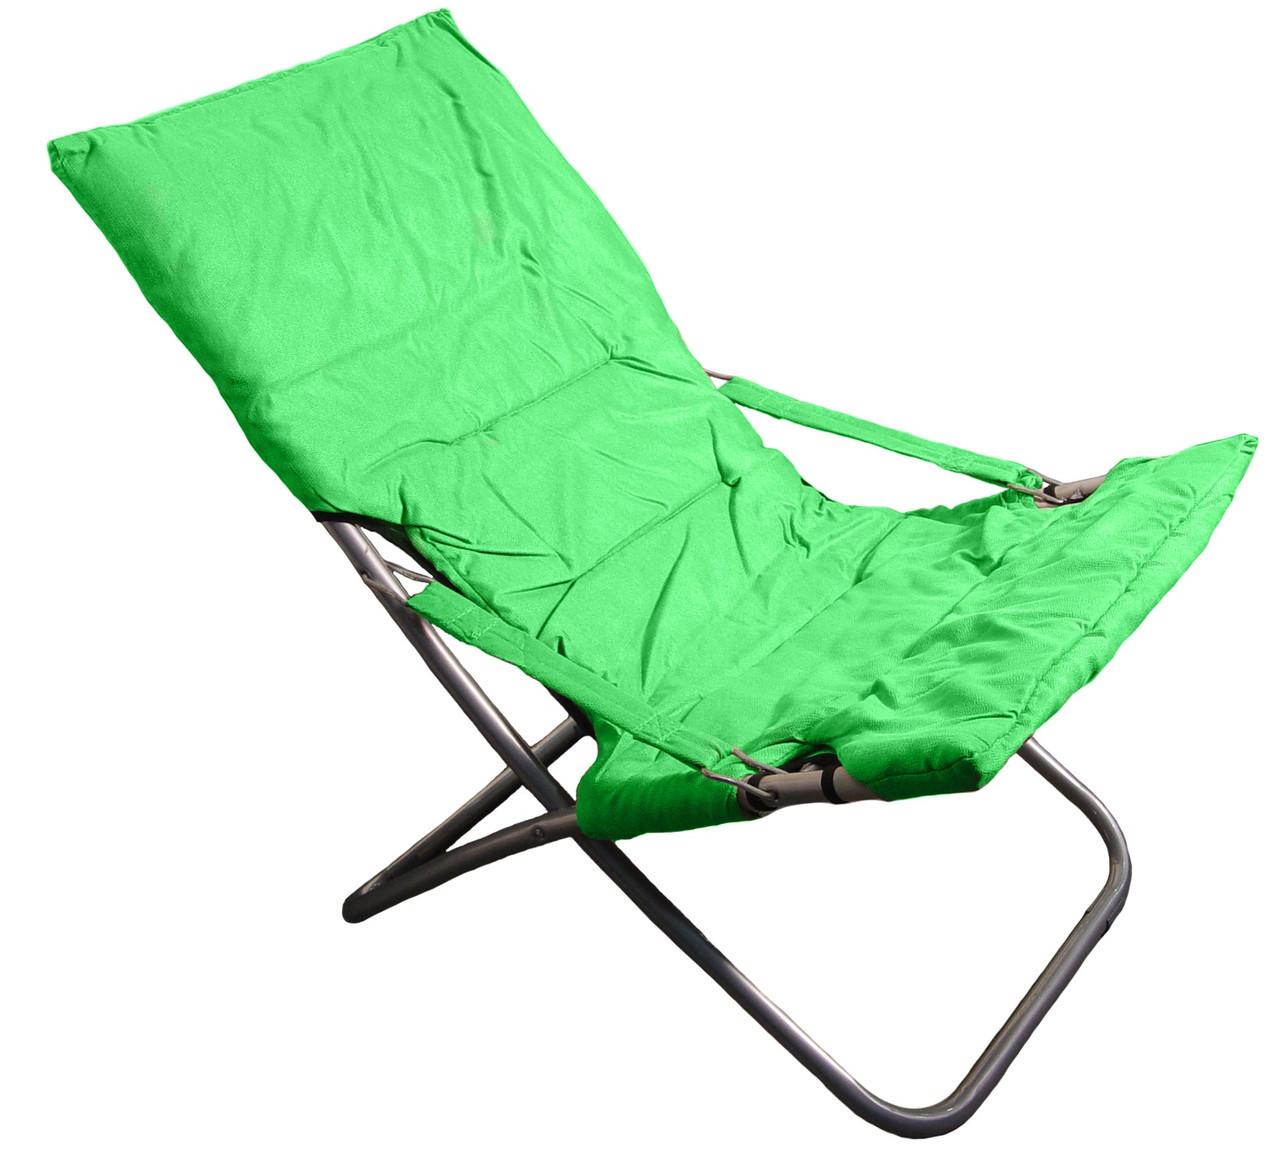 Кресло-шезлонг R28812 100х61х95 см, зеленое